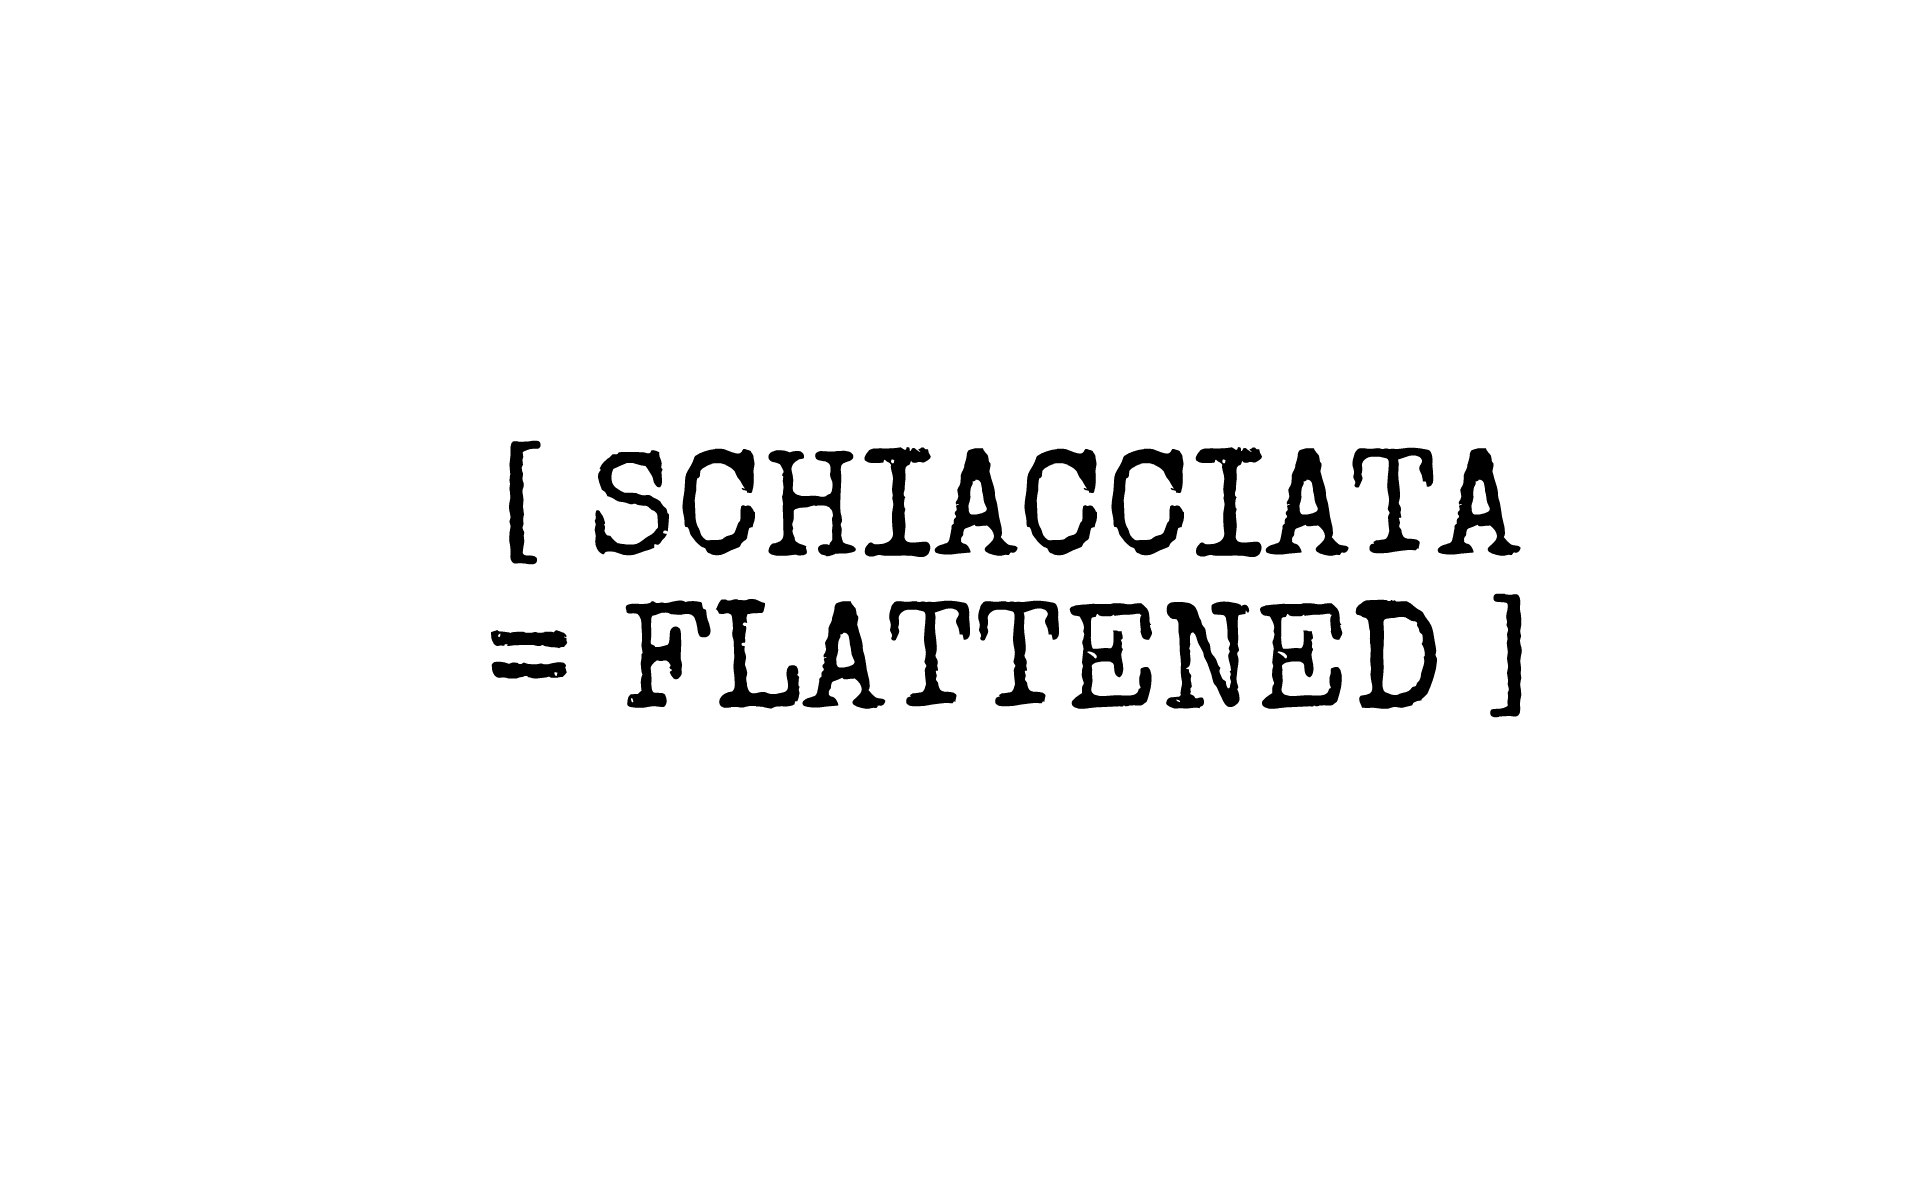 SCHIACCIATA